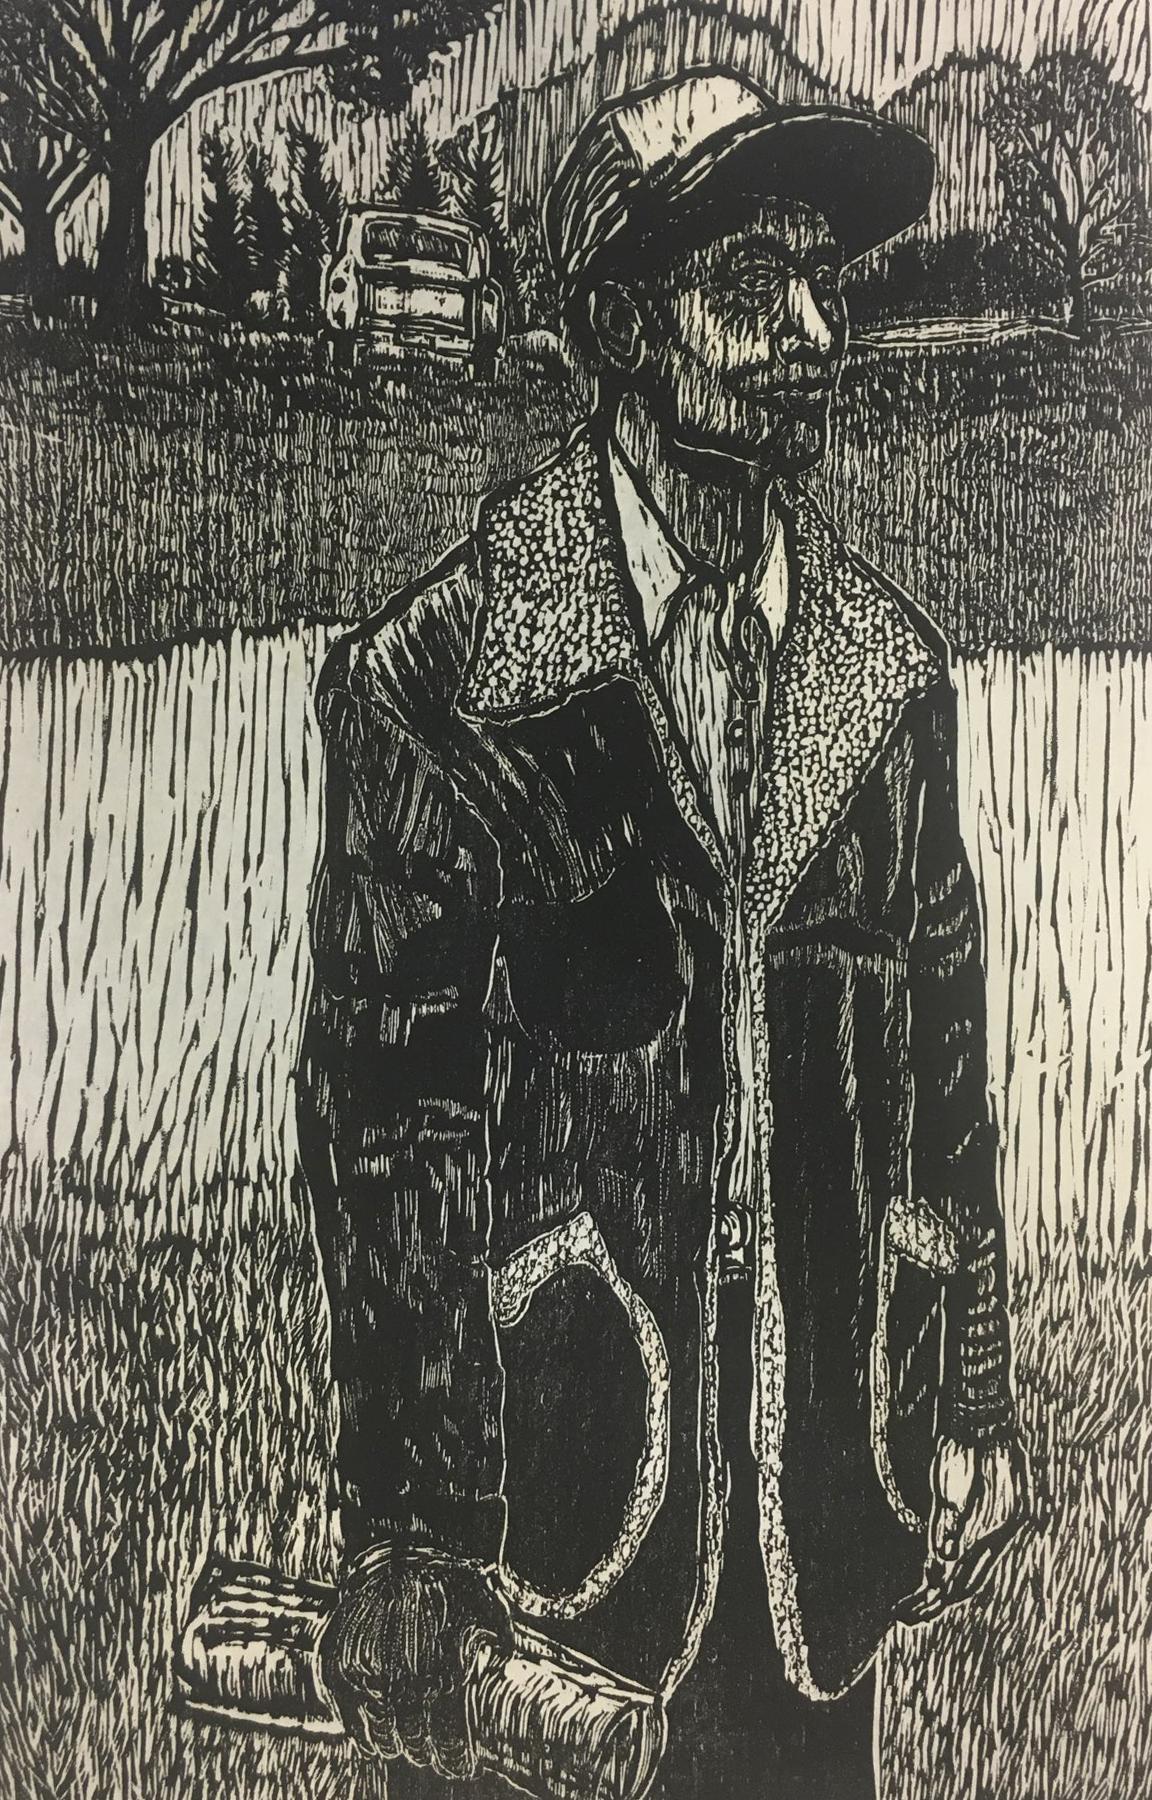 Dennis Winston,  Country Portrait III,  woodcut print